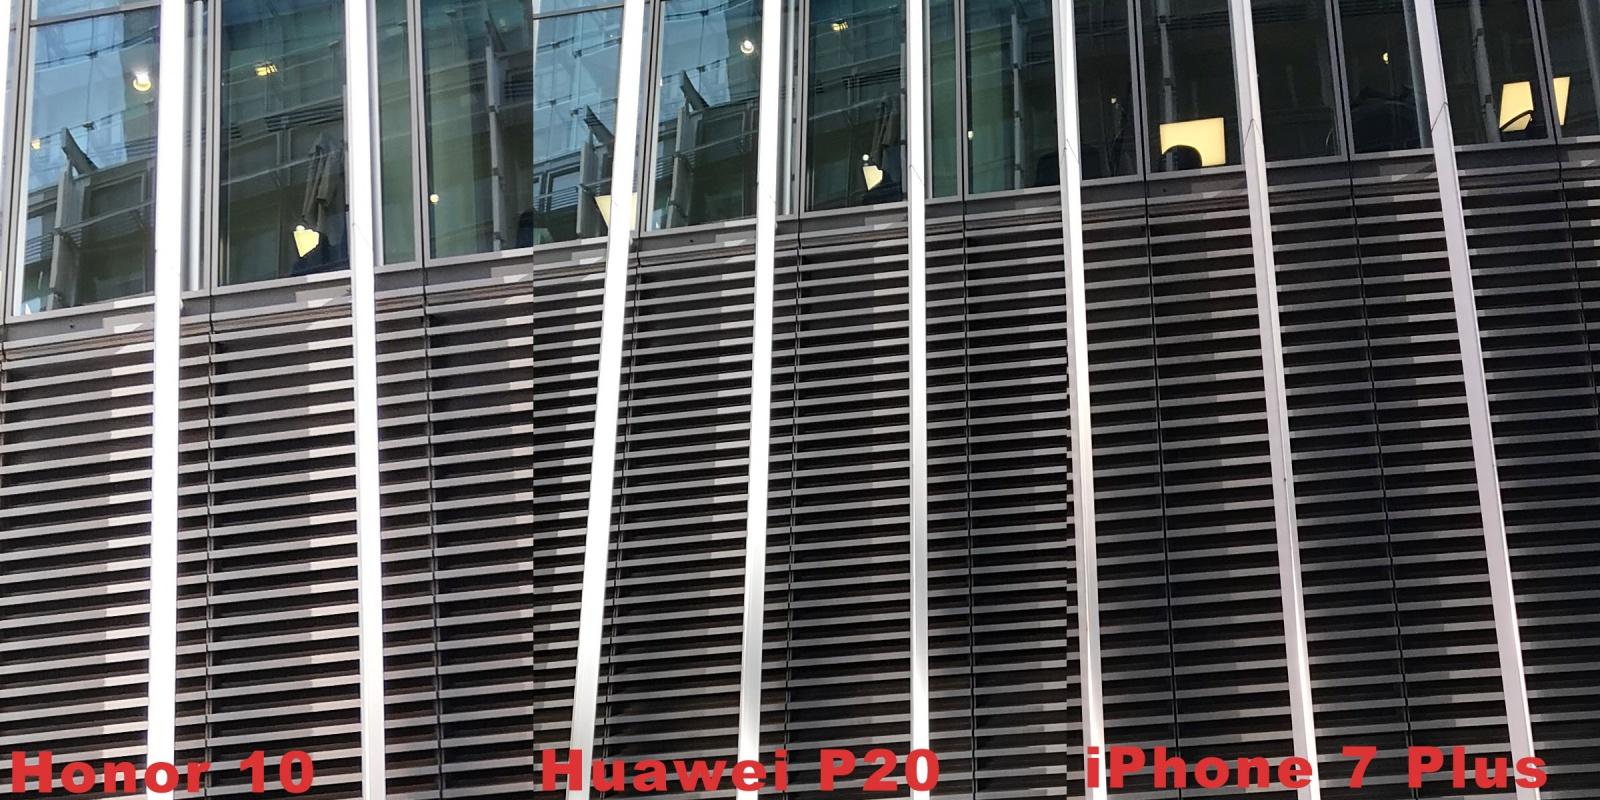 Как фотографирует новый Honor 10. Сравниваем с Huawei P20 и iPhone 7 Plus - 21